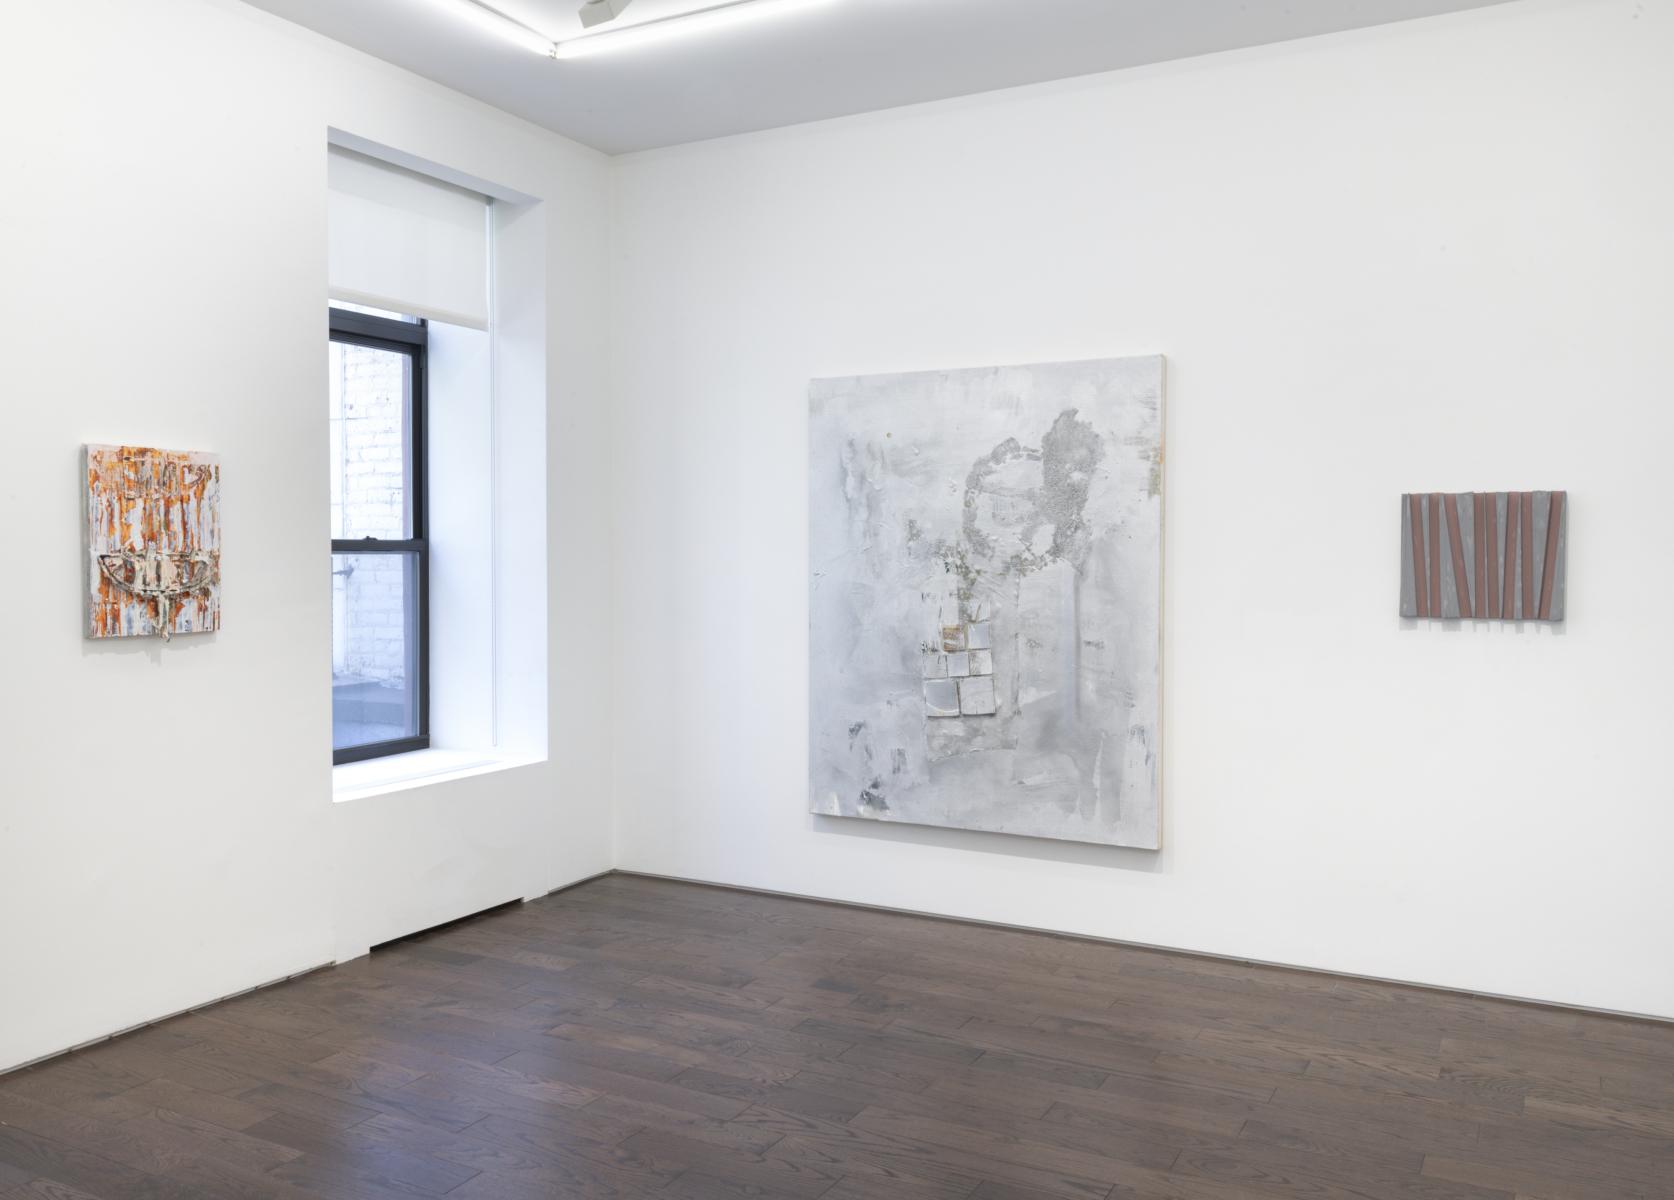 Exhibition View Wrecked Angle Ceysson & Bénétière New York 2021 (4)